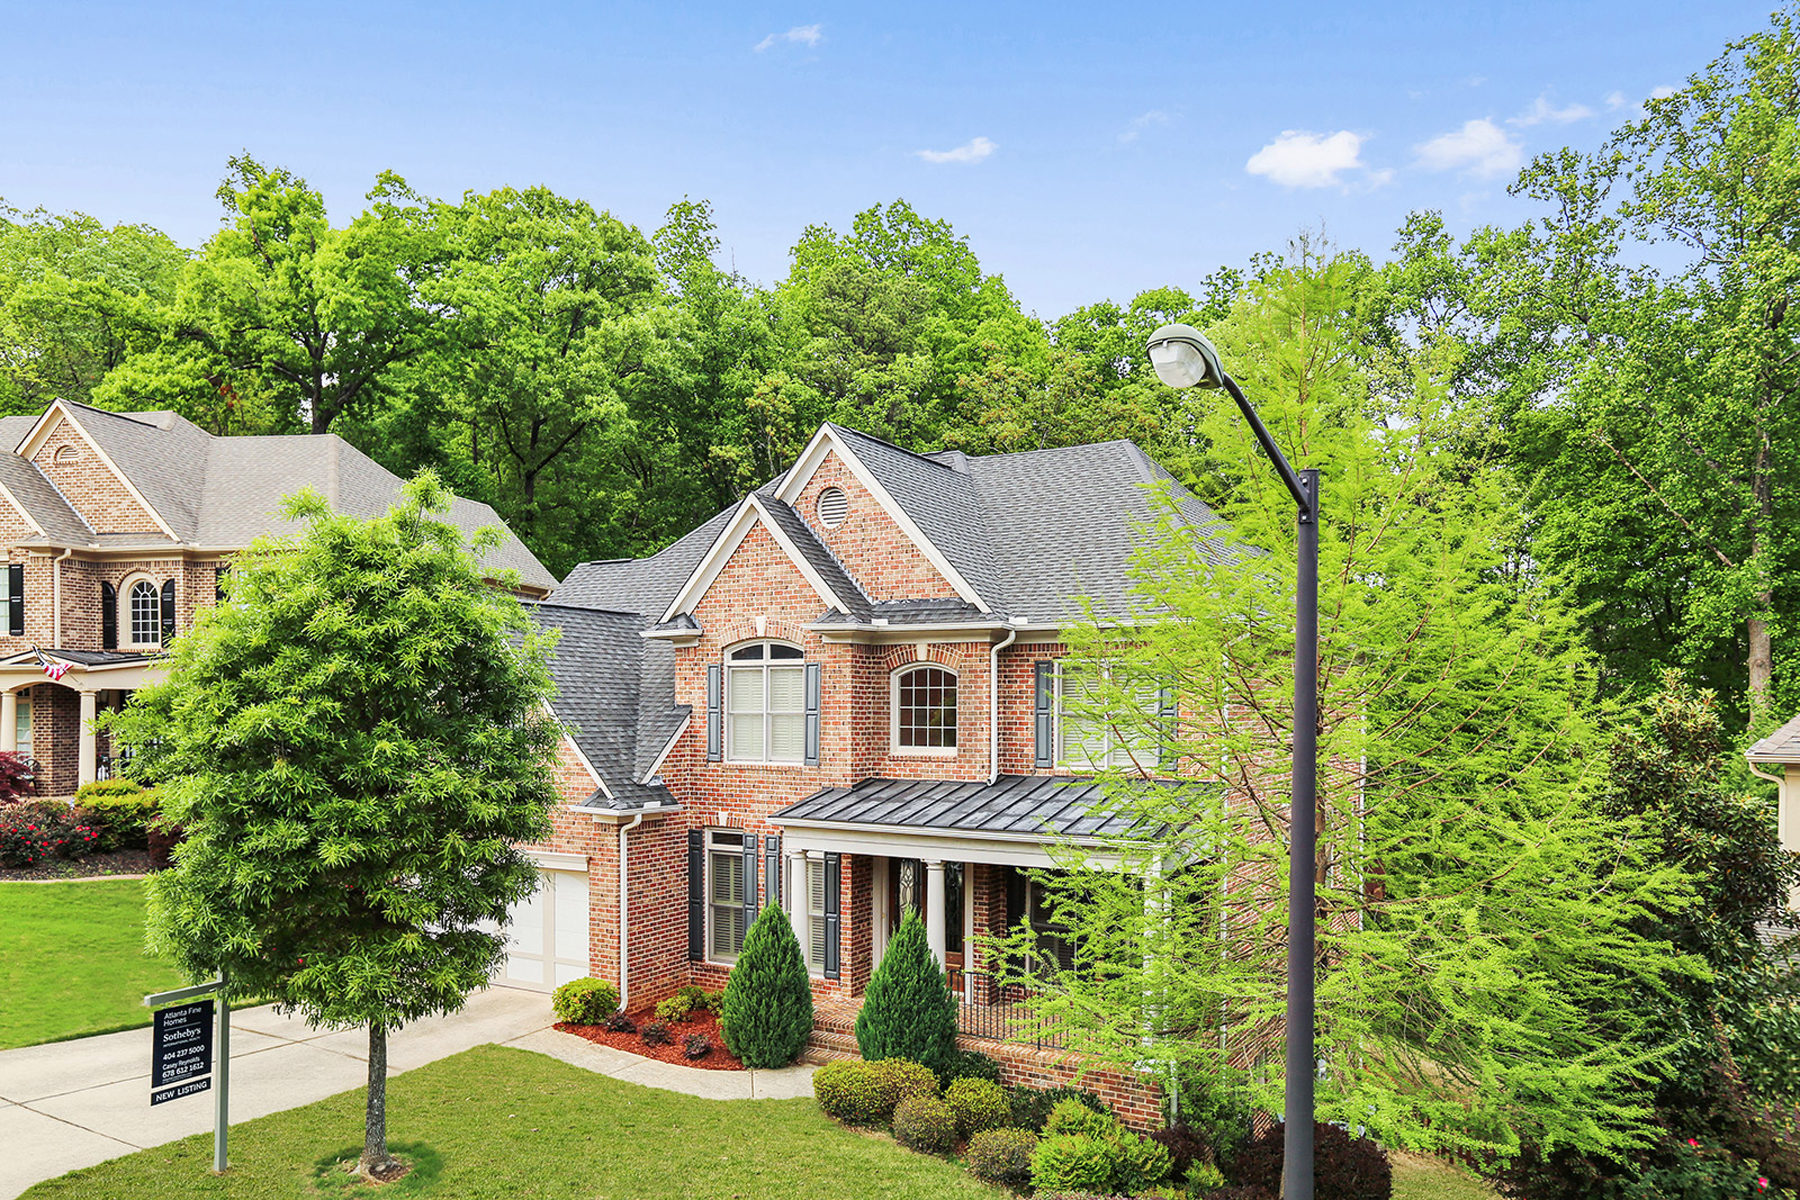 獨棟家庭住宅 為 出售 在 A Sophisticated Mableton Masterpiece 5546 Highland Preserve Drive Mableton, 喬治亞州, 30126 美國